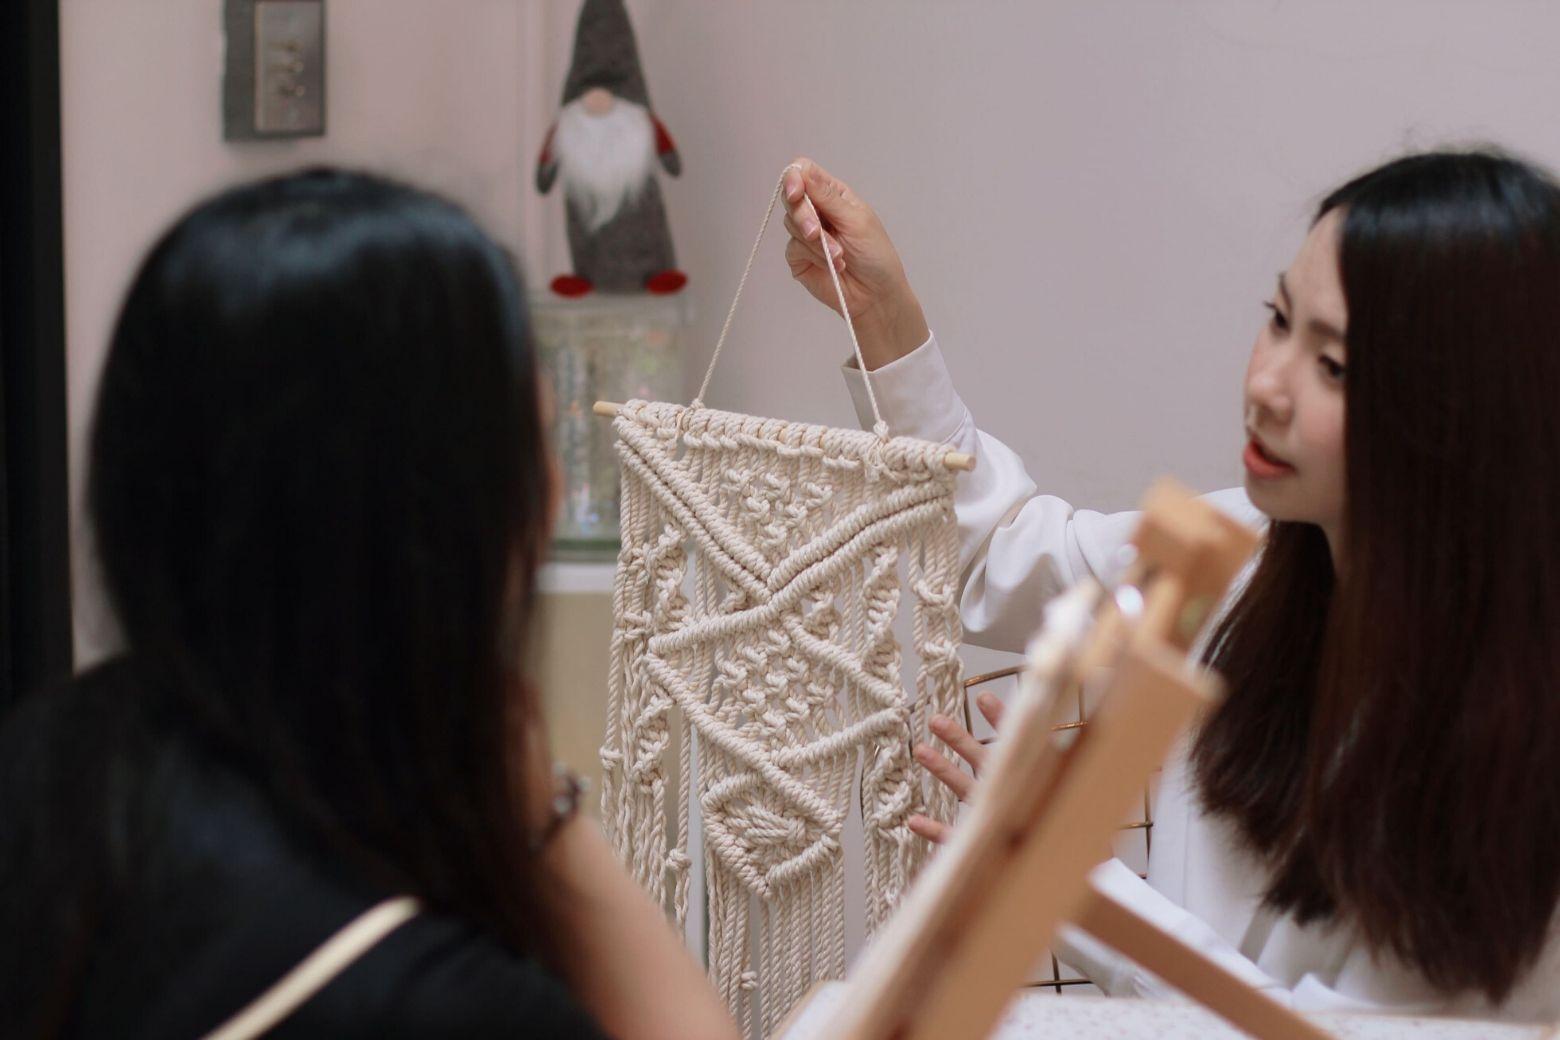 Macrame 編織掛飾開箱|熱愛波希米亞風的你絕不能錯過的體驗